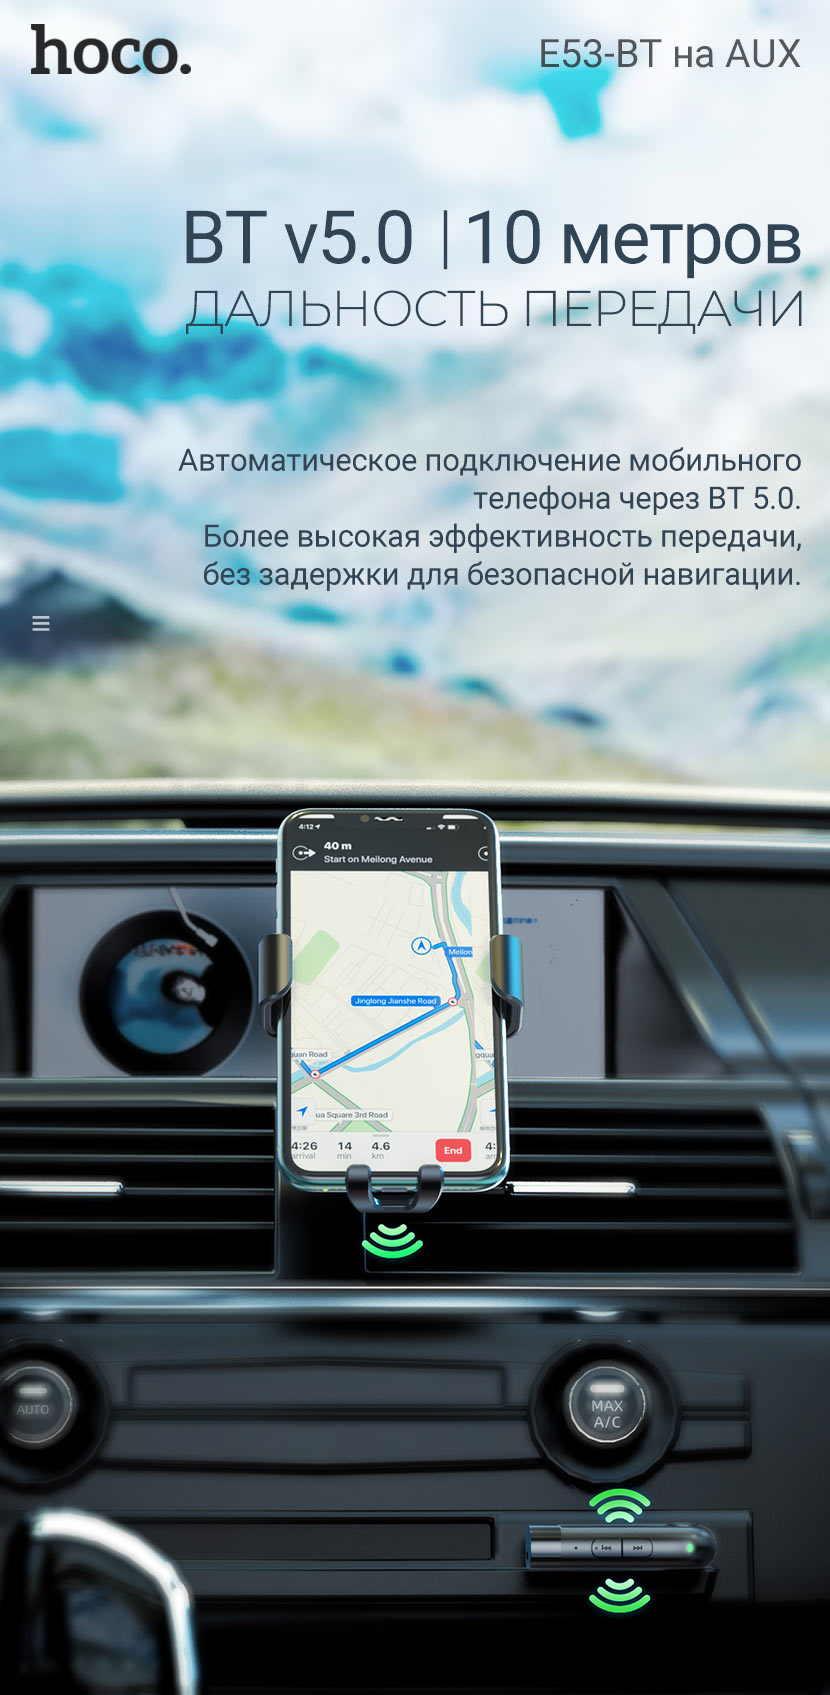 hoco news e53 dawn sound in car aux wireless receiver transmission ru